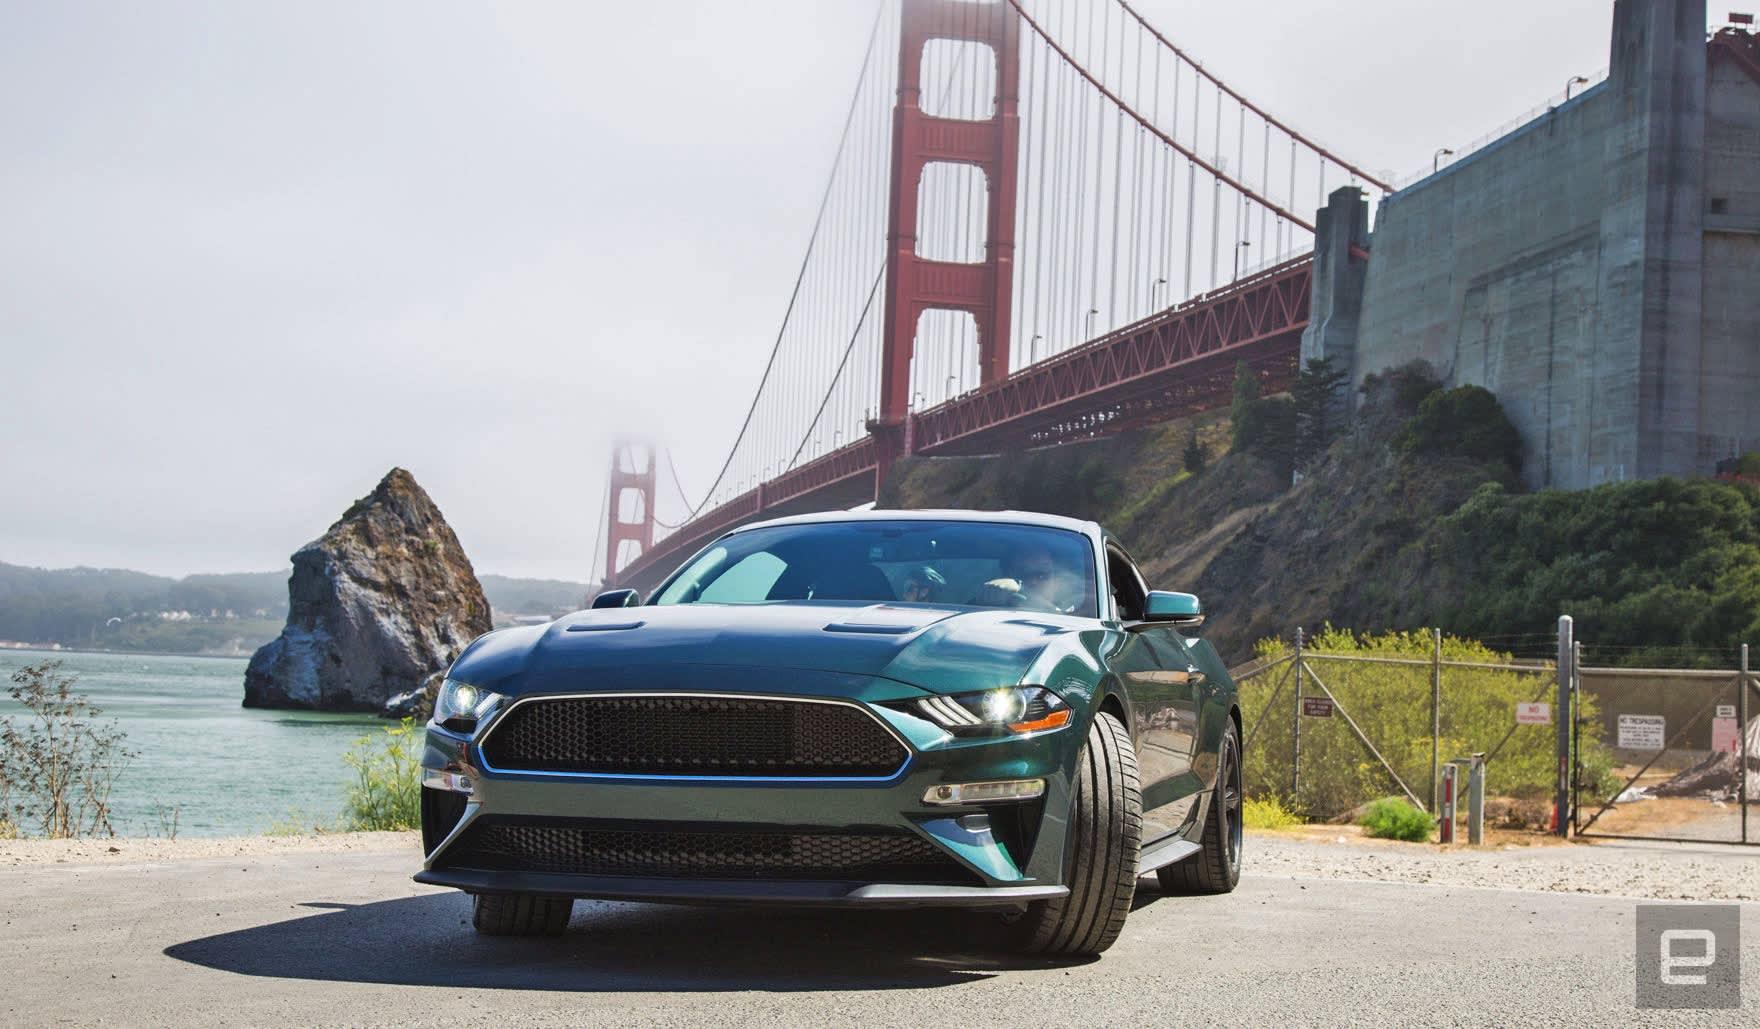 Ford mustang bullitt review almost steve mcqueen cool